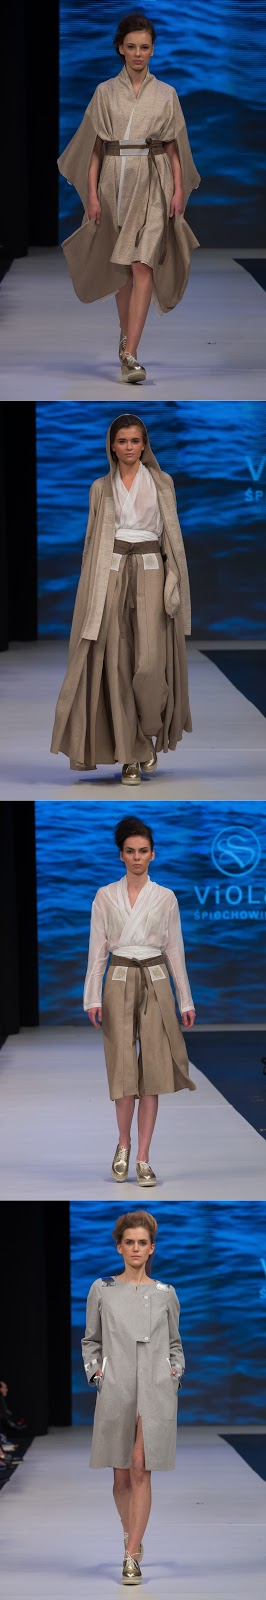 Viola Śpiechowicz XIII FashionPhilosophy Fashion Week Poland (c) 2015 Mike Pasarella